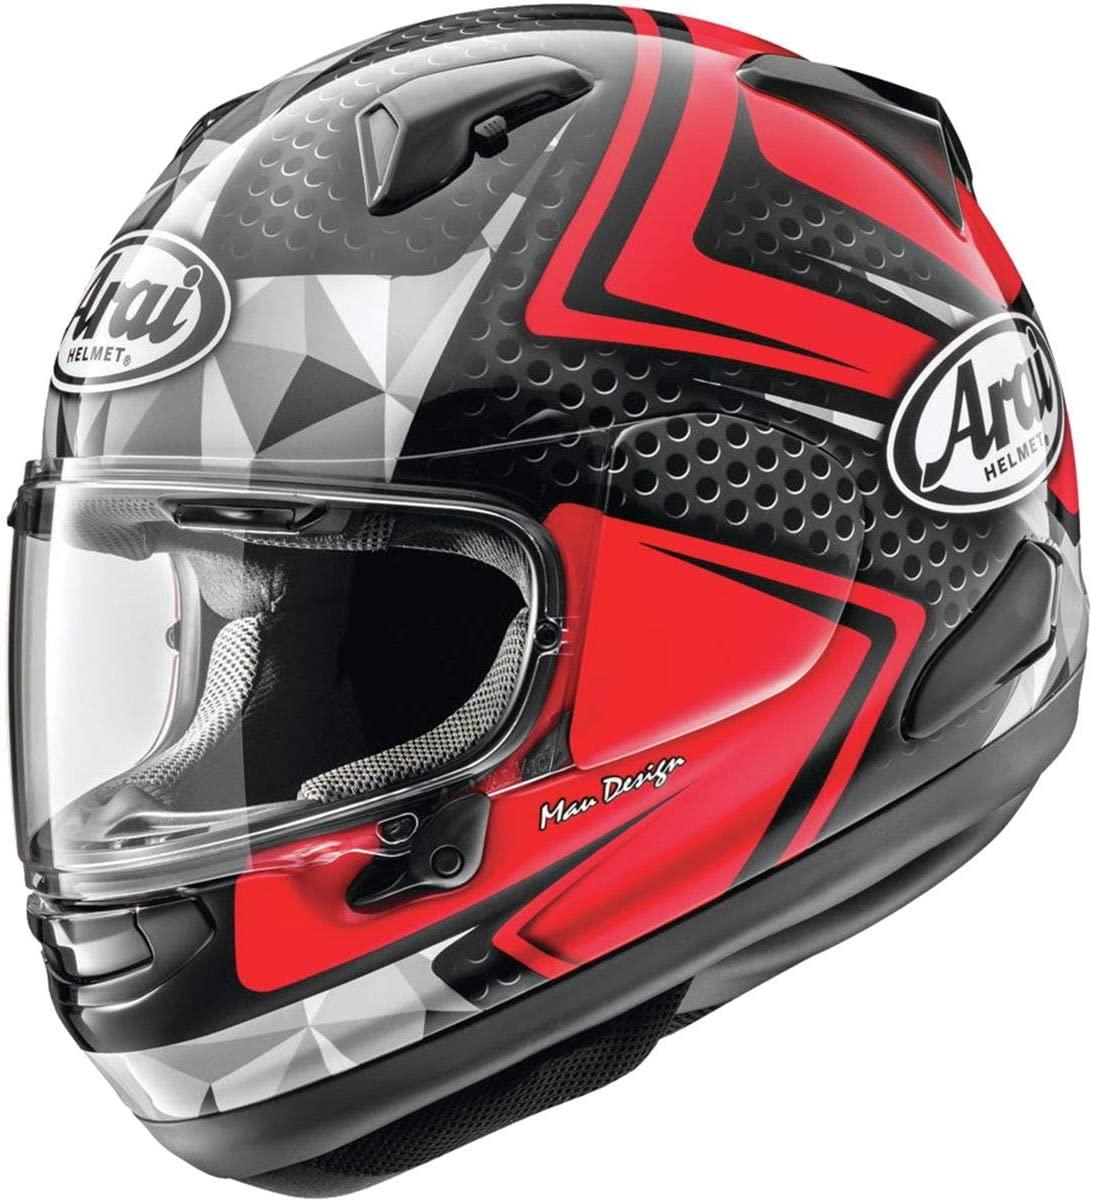 Arai Signet X Helmet - Dyno (Small) (RED)